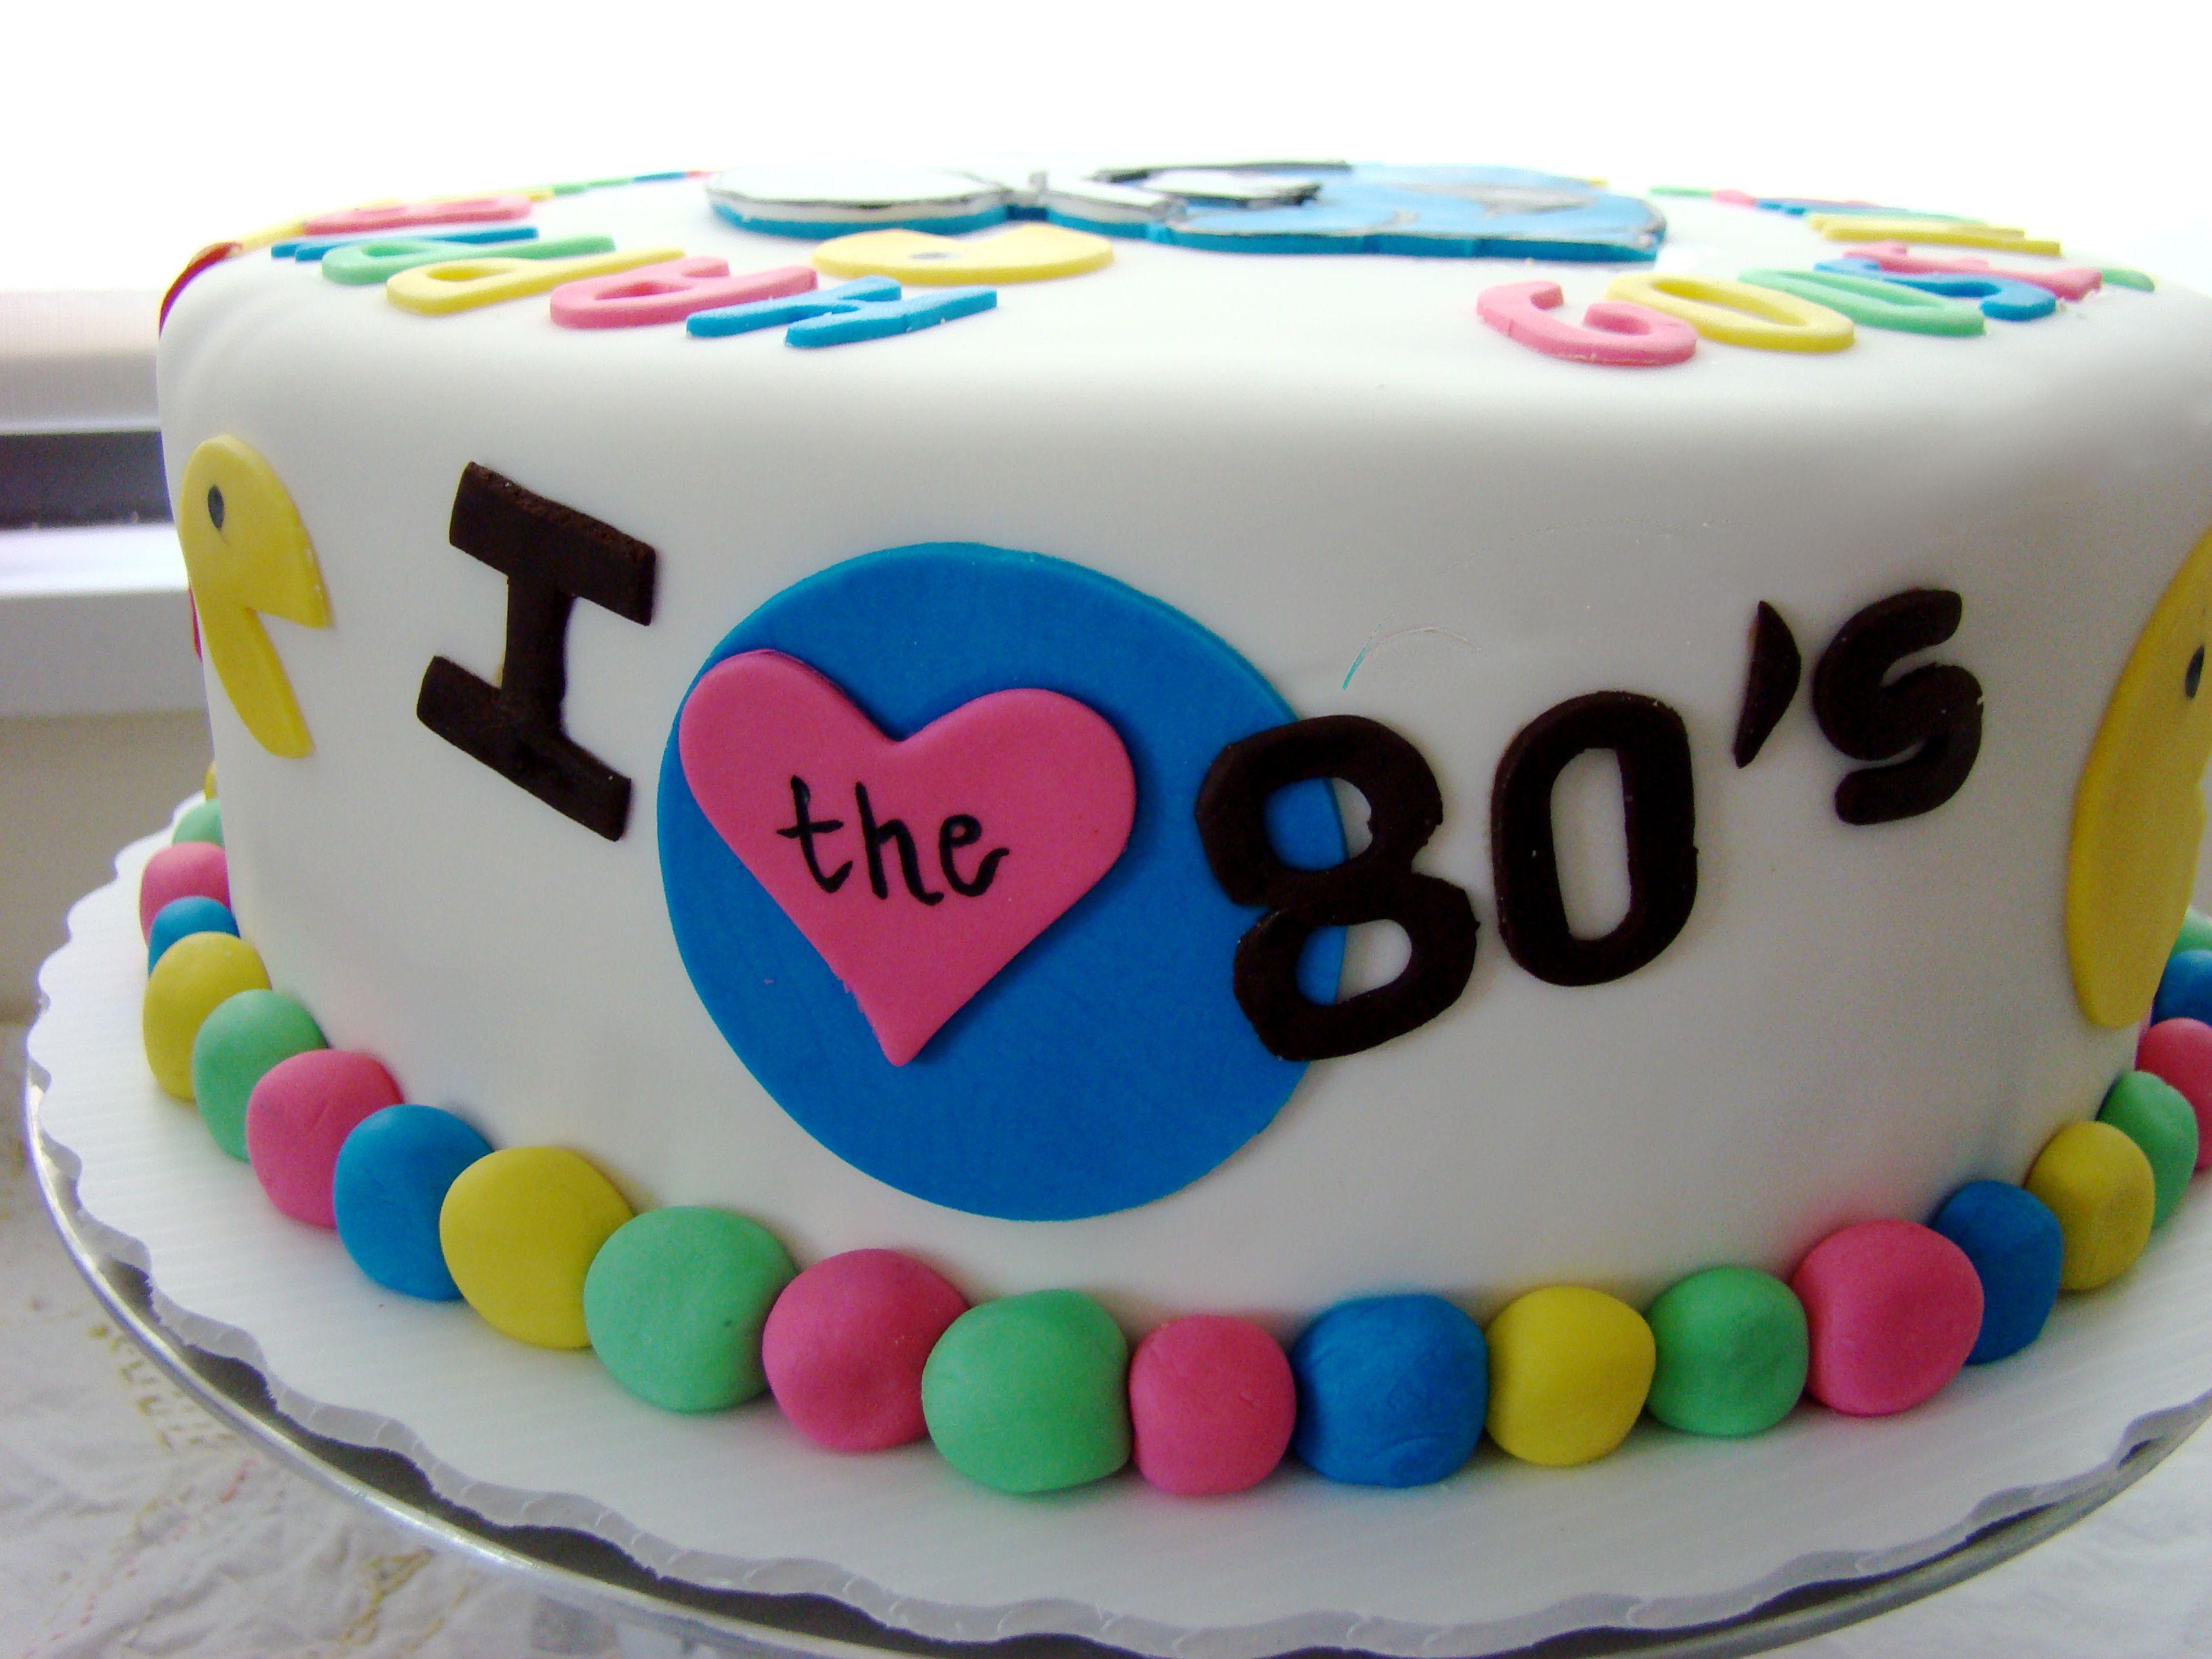 Excellent 80S Easy Birthday Cakes 80S Themed Birthday Cake Cakery Cakes Funny Birthday Cards Online Elaedamsfinfo